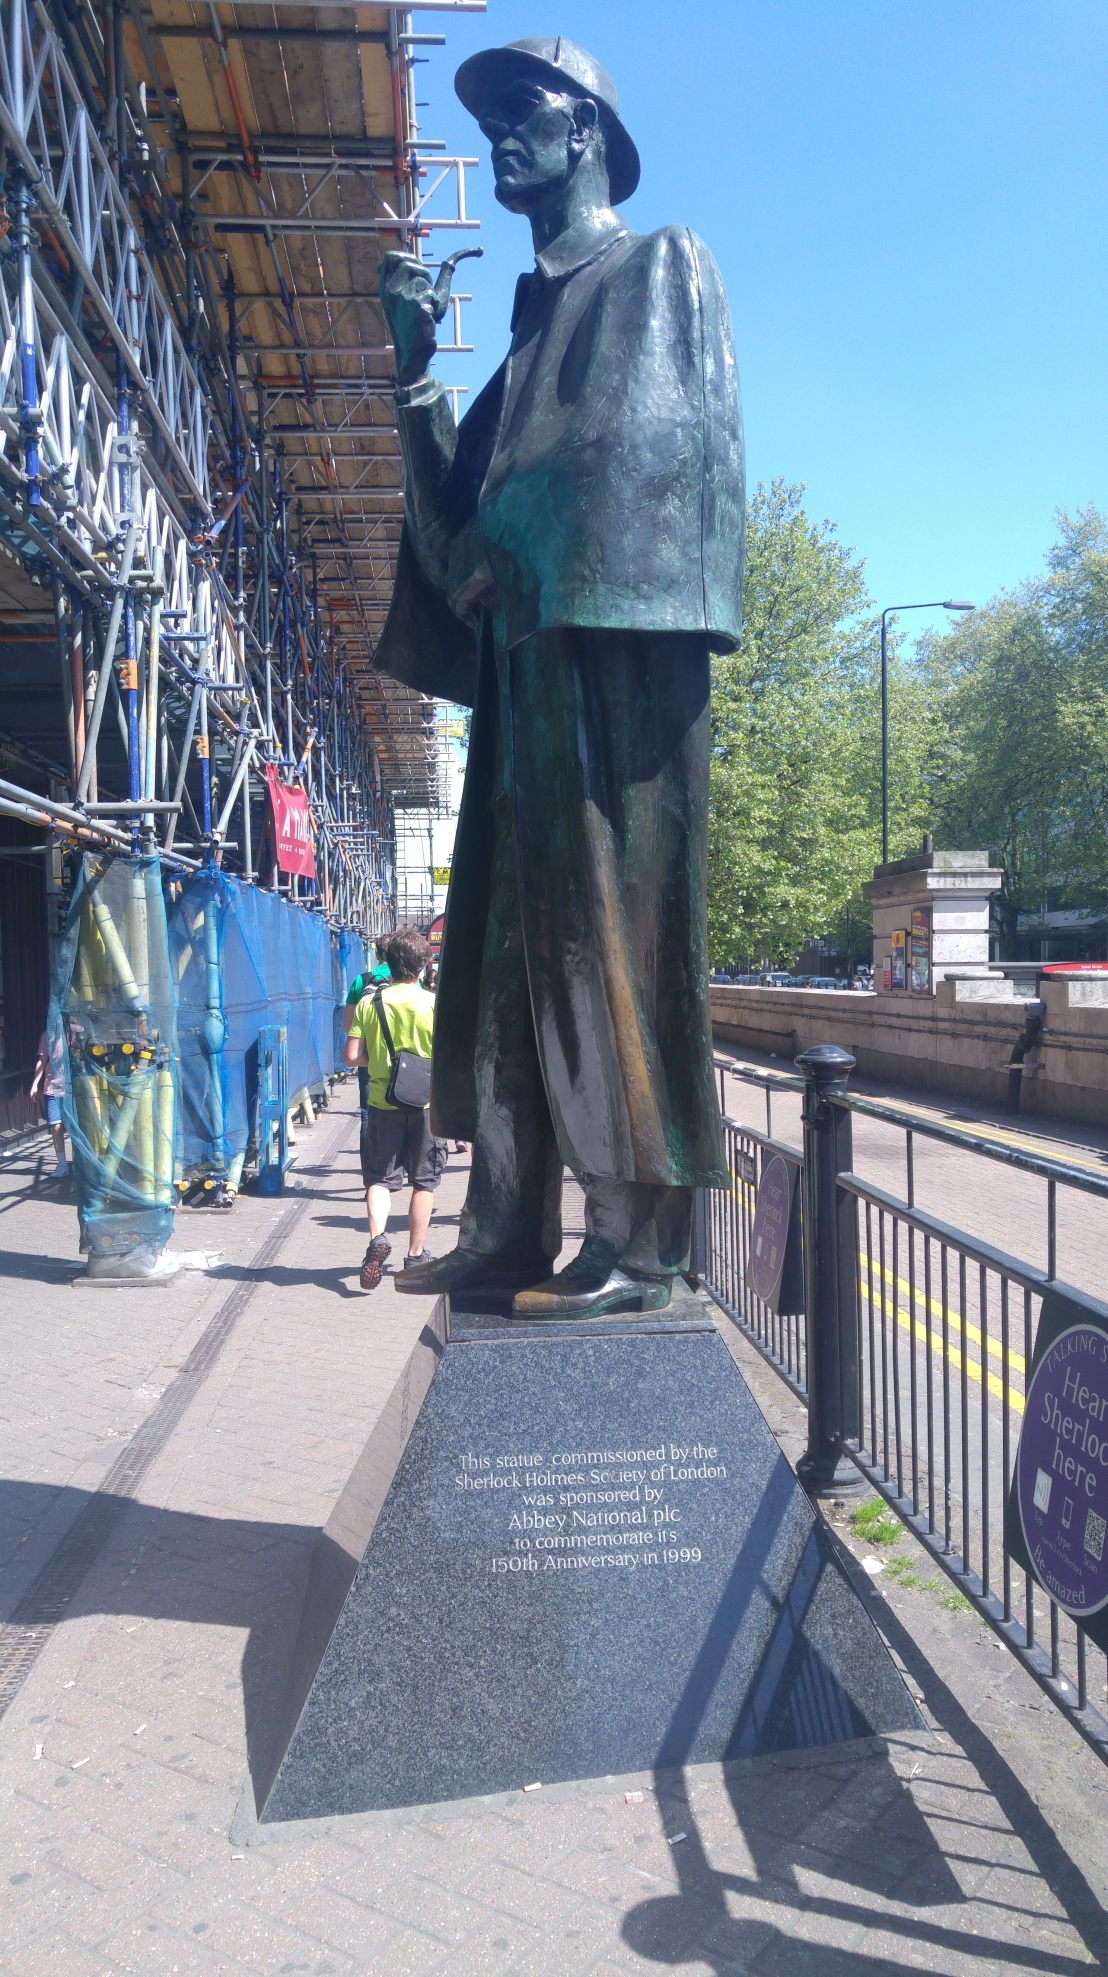 London trip - Sherlock Holmes statue